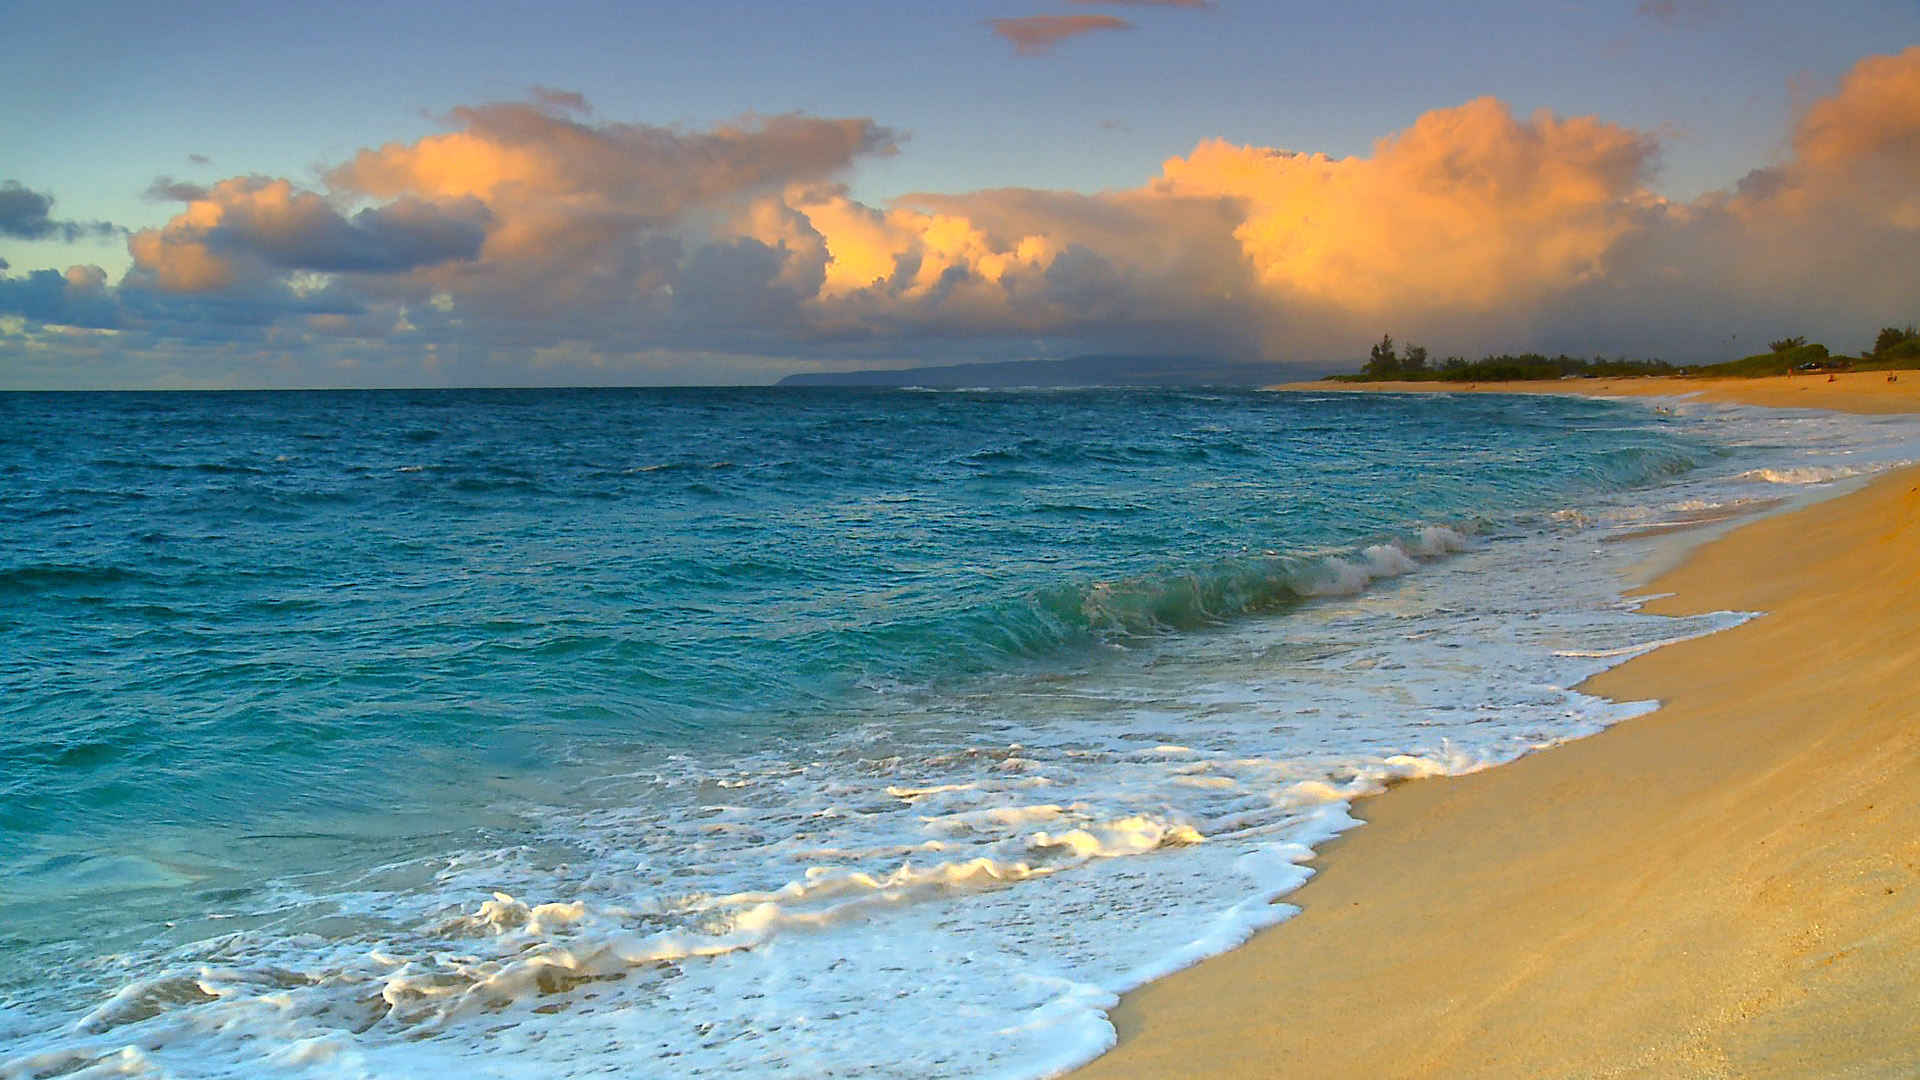 Hawaii Background Screensaver Beach Beaches Media Webshots Beautiful 1920x1080